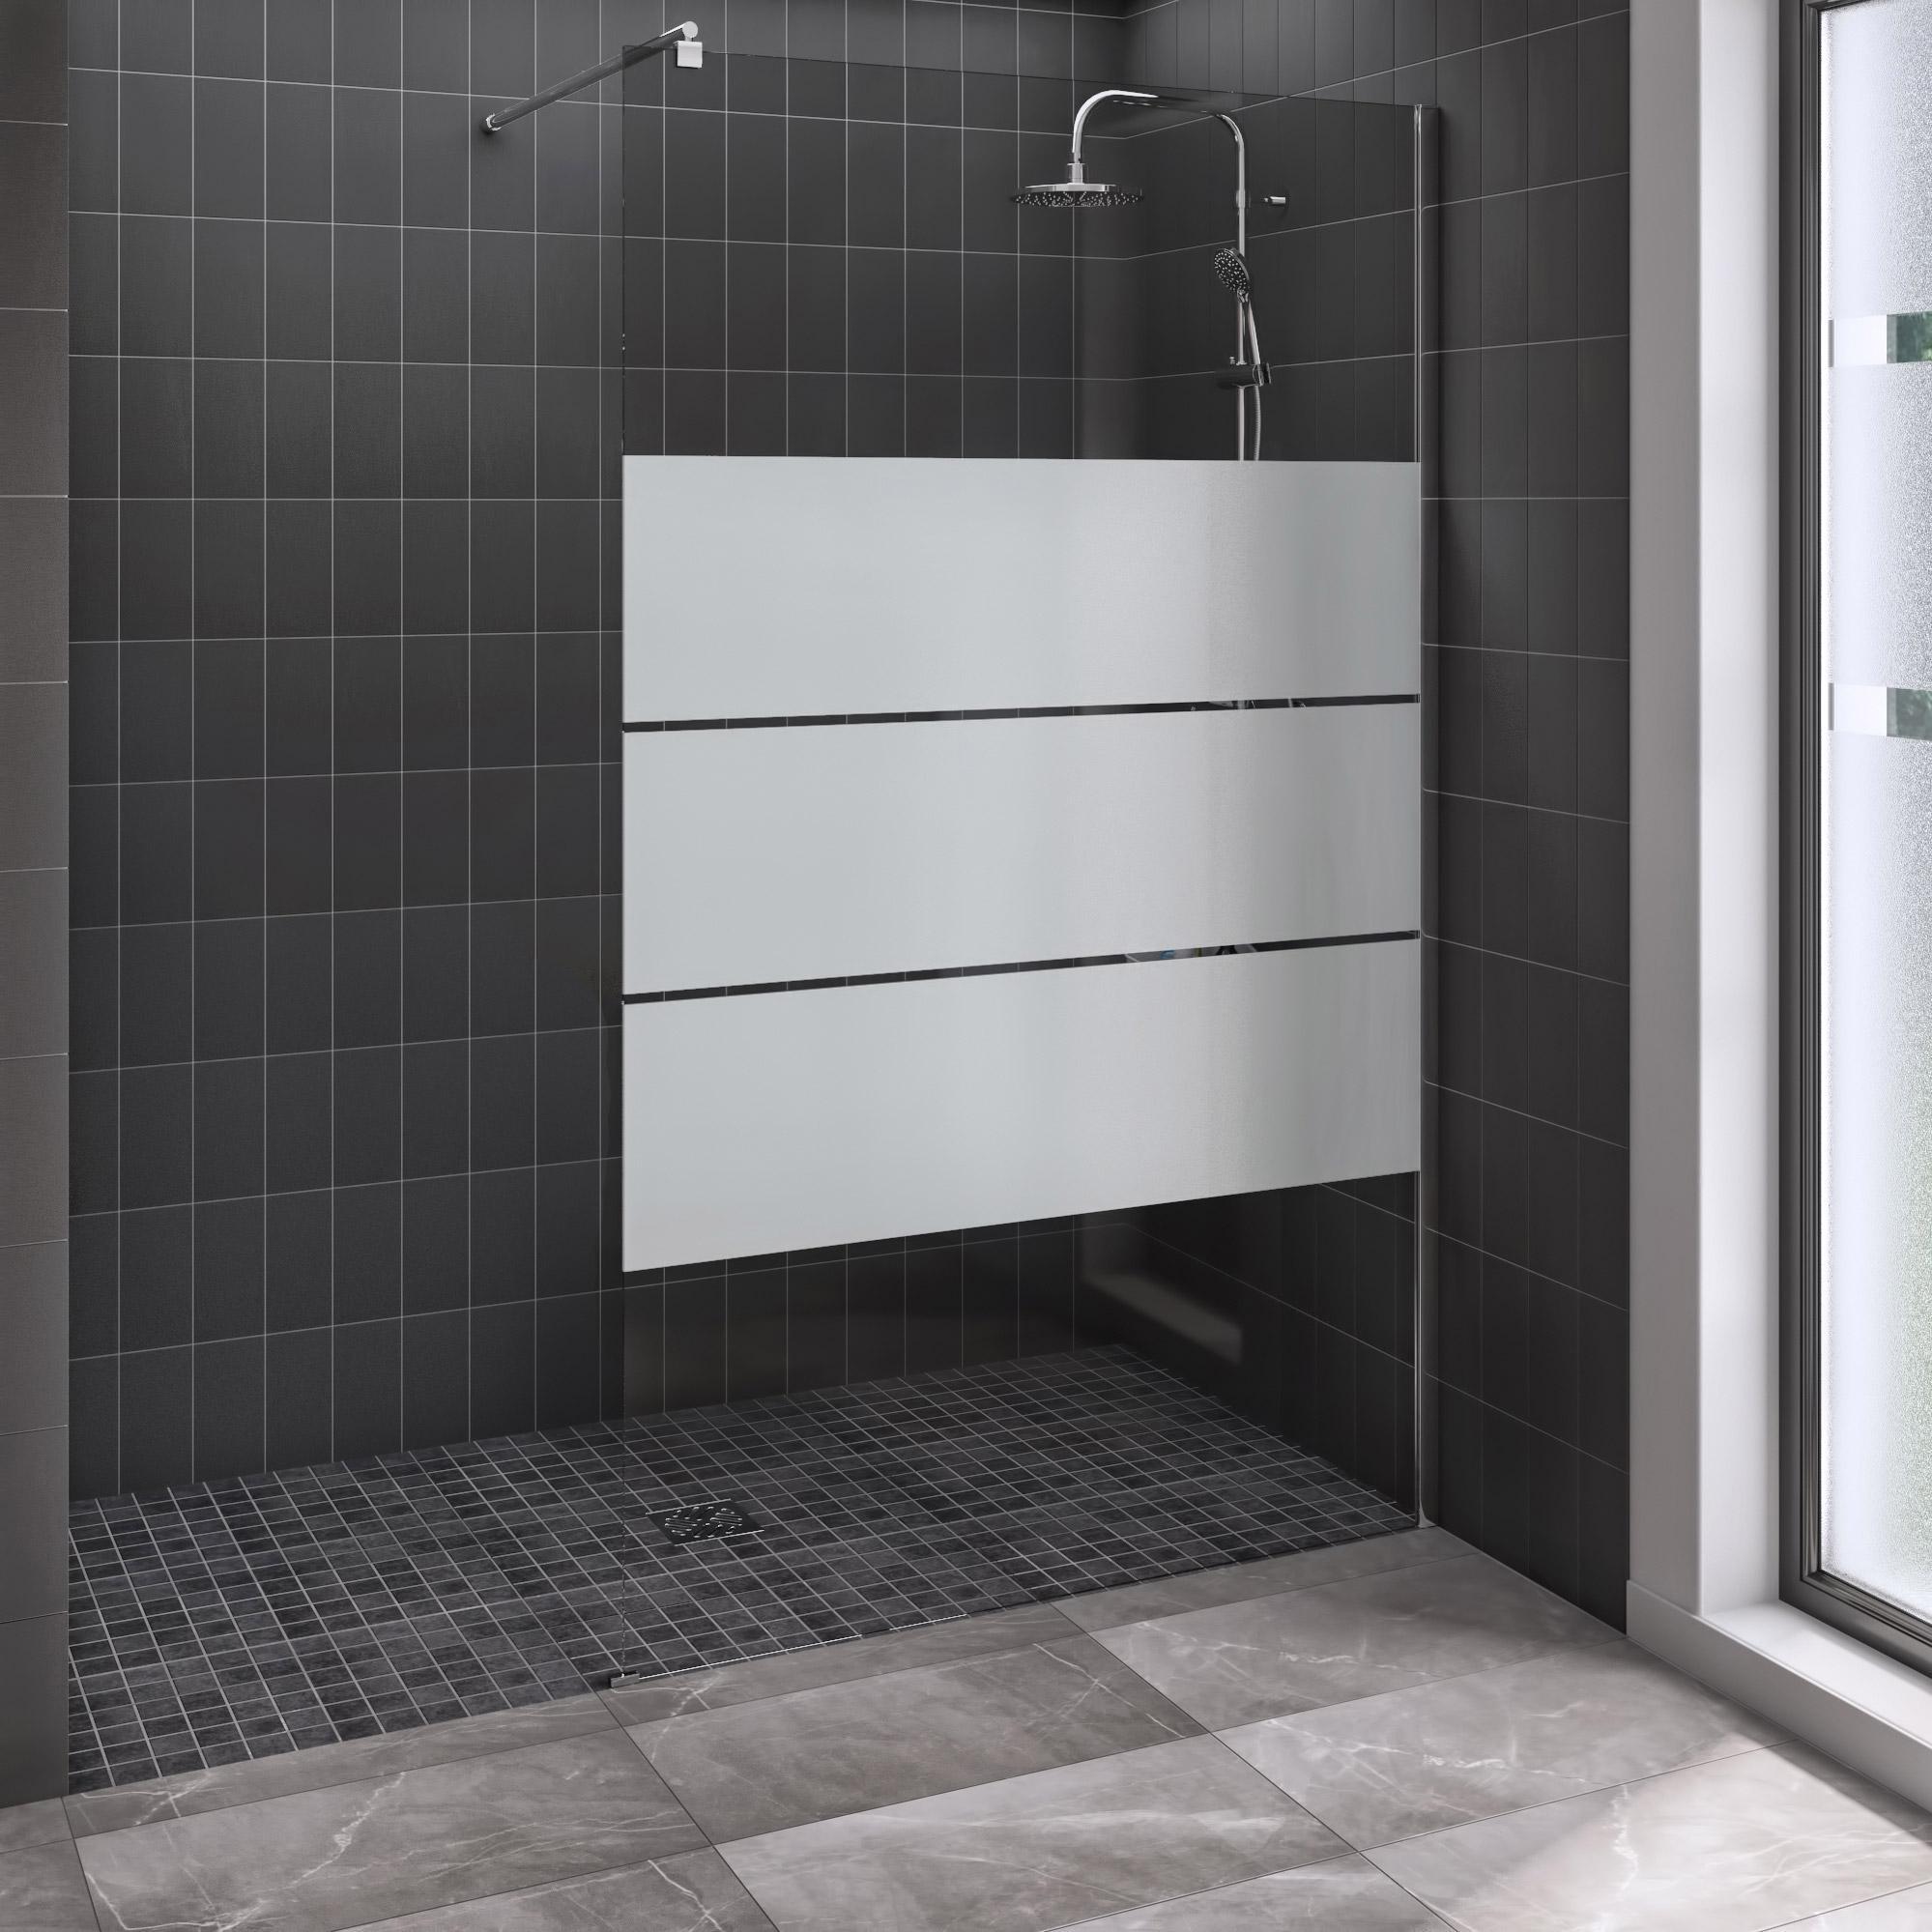 Devis Plomberie  La Ciotat ▷ Tarif Installation & Rénovation Sanitaire